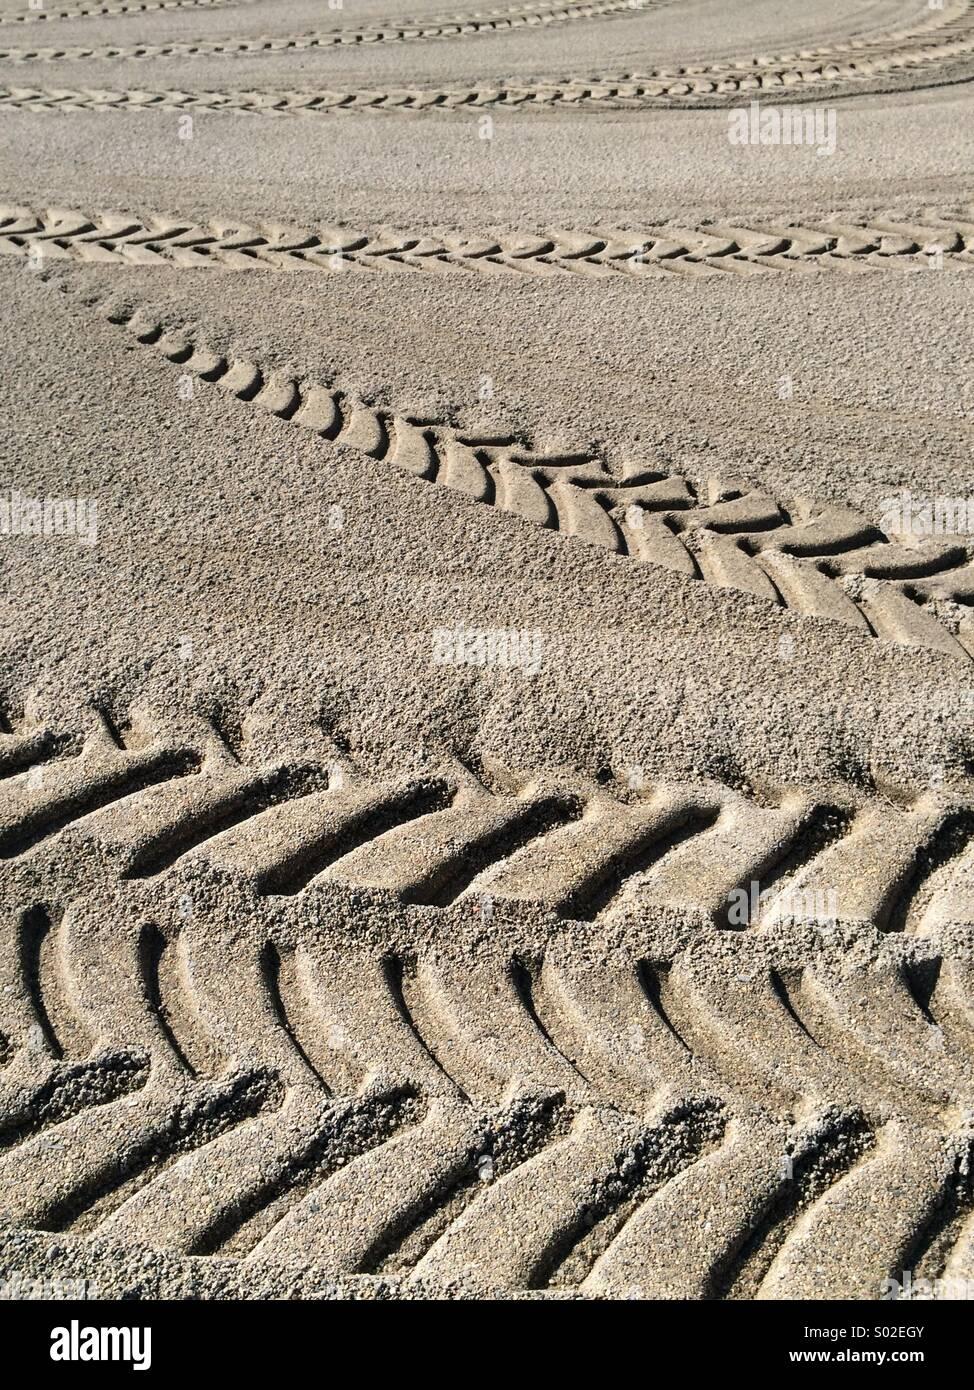 Sand beach tracks print impress trace seashore wheels tyres - Stock Image